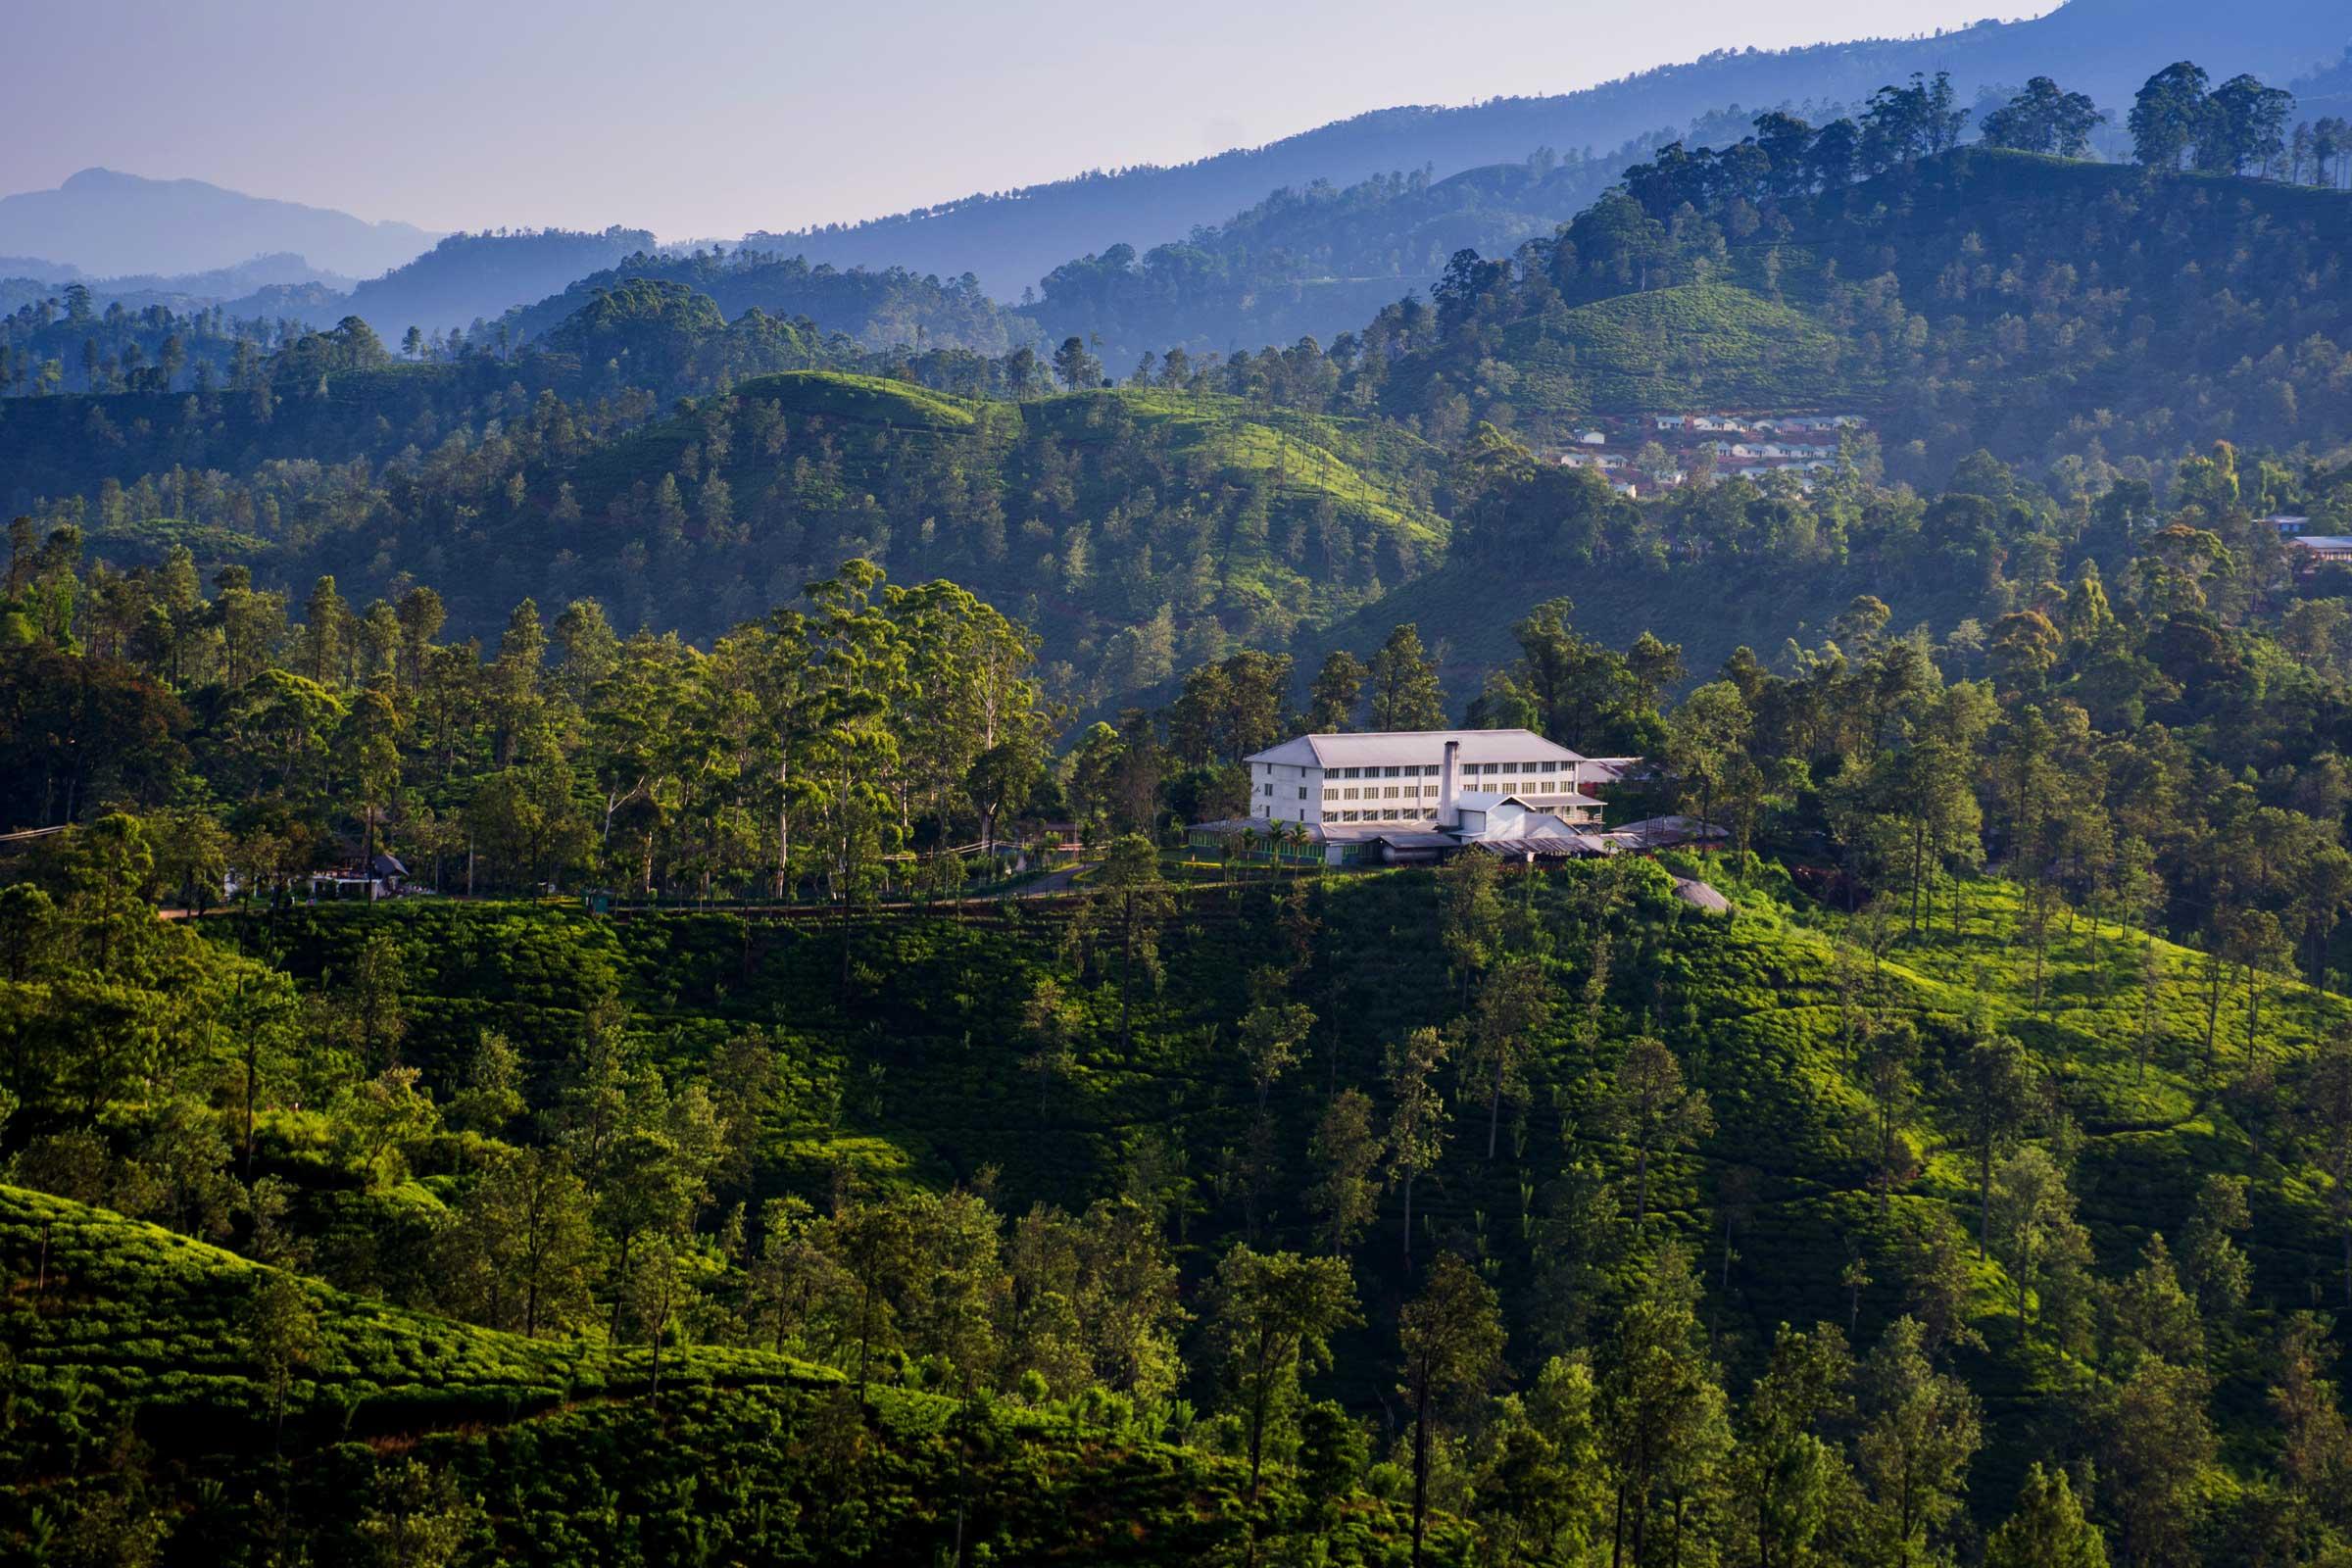 A tea estate factory